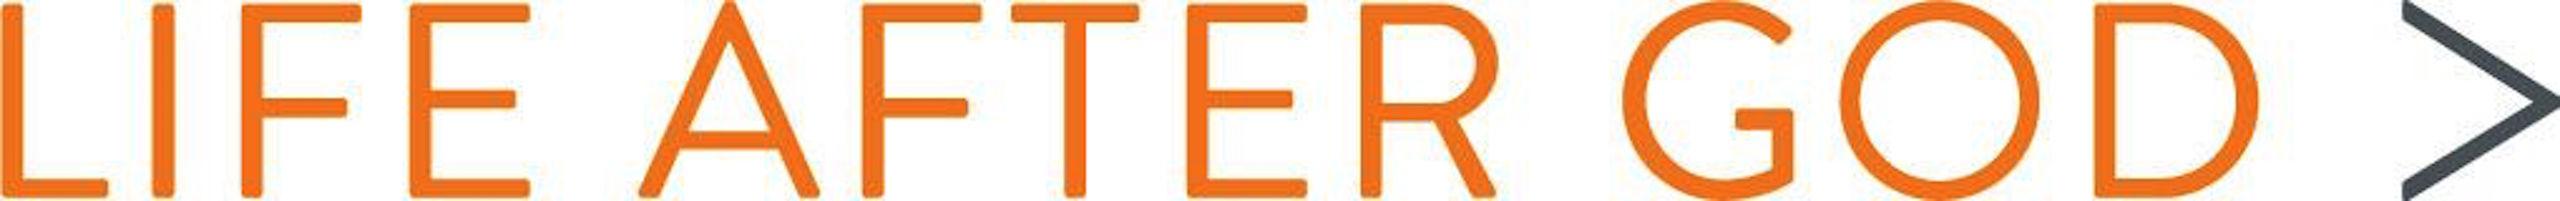 LAG_horizontal two color orange text